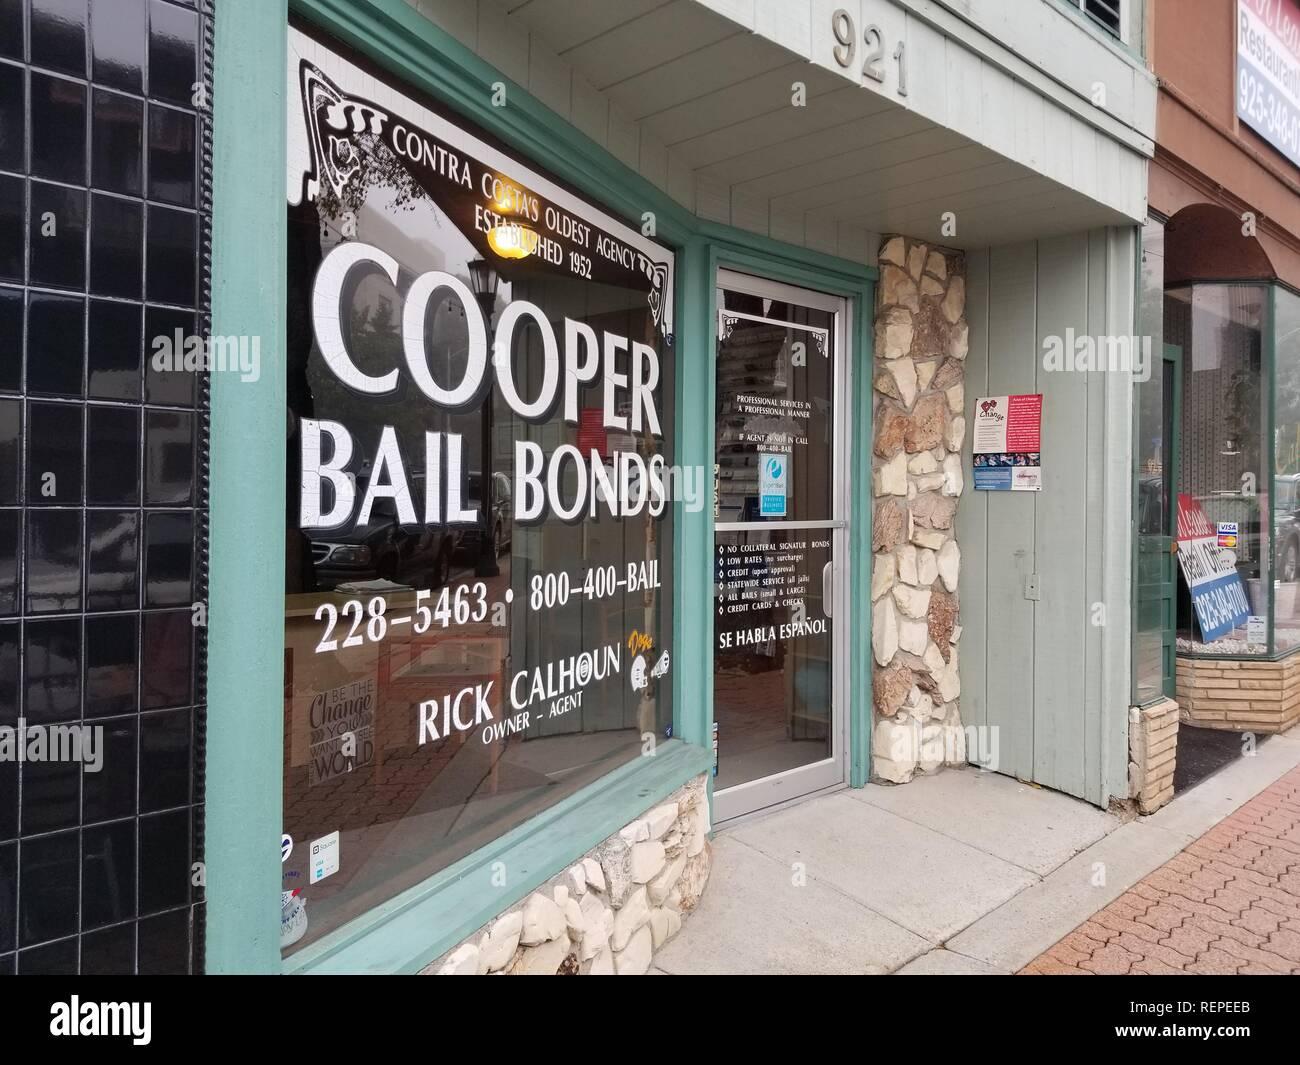 Storefront of Cooper Bail Bonds, originally established in 1952, near Contra Costa superior court in Martinez, California, January 10, 2019. () - Stock Image